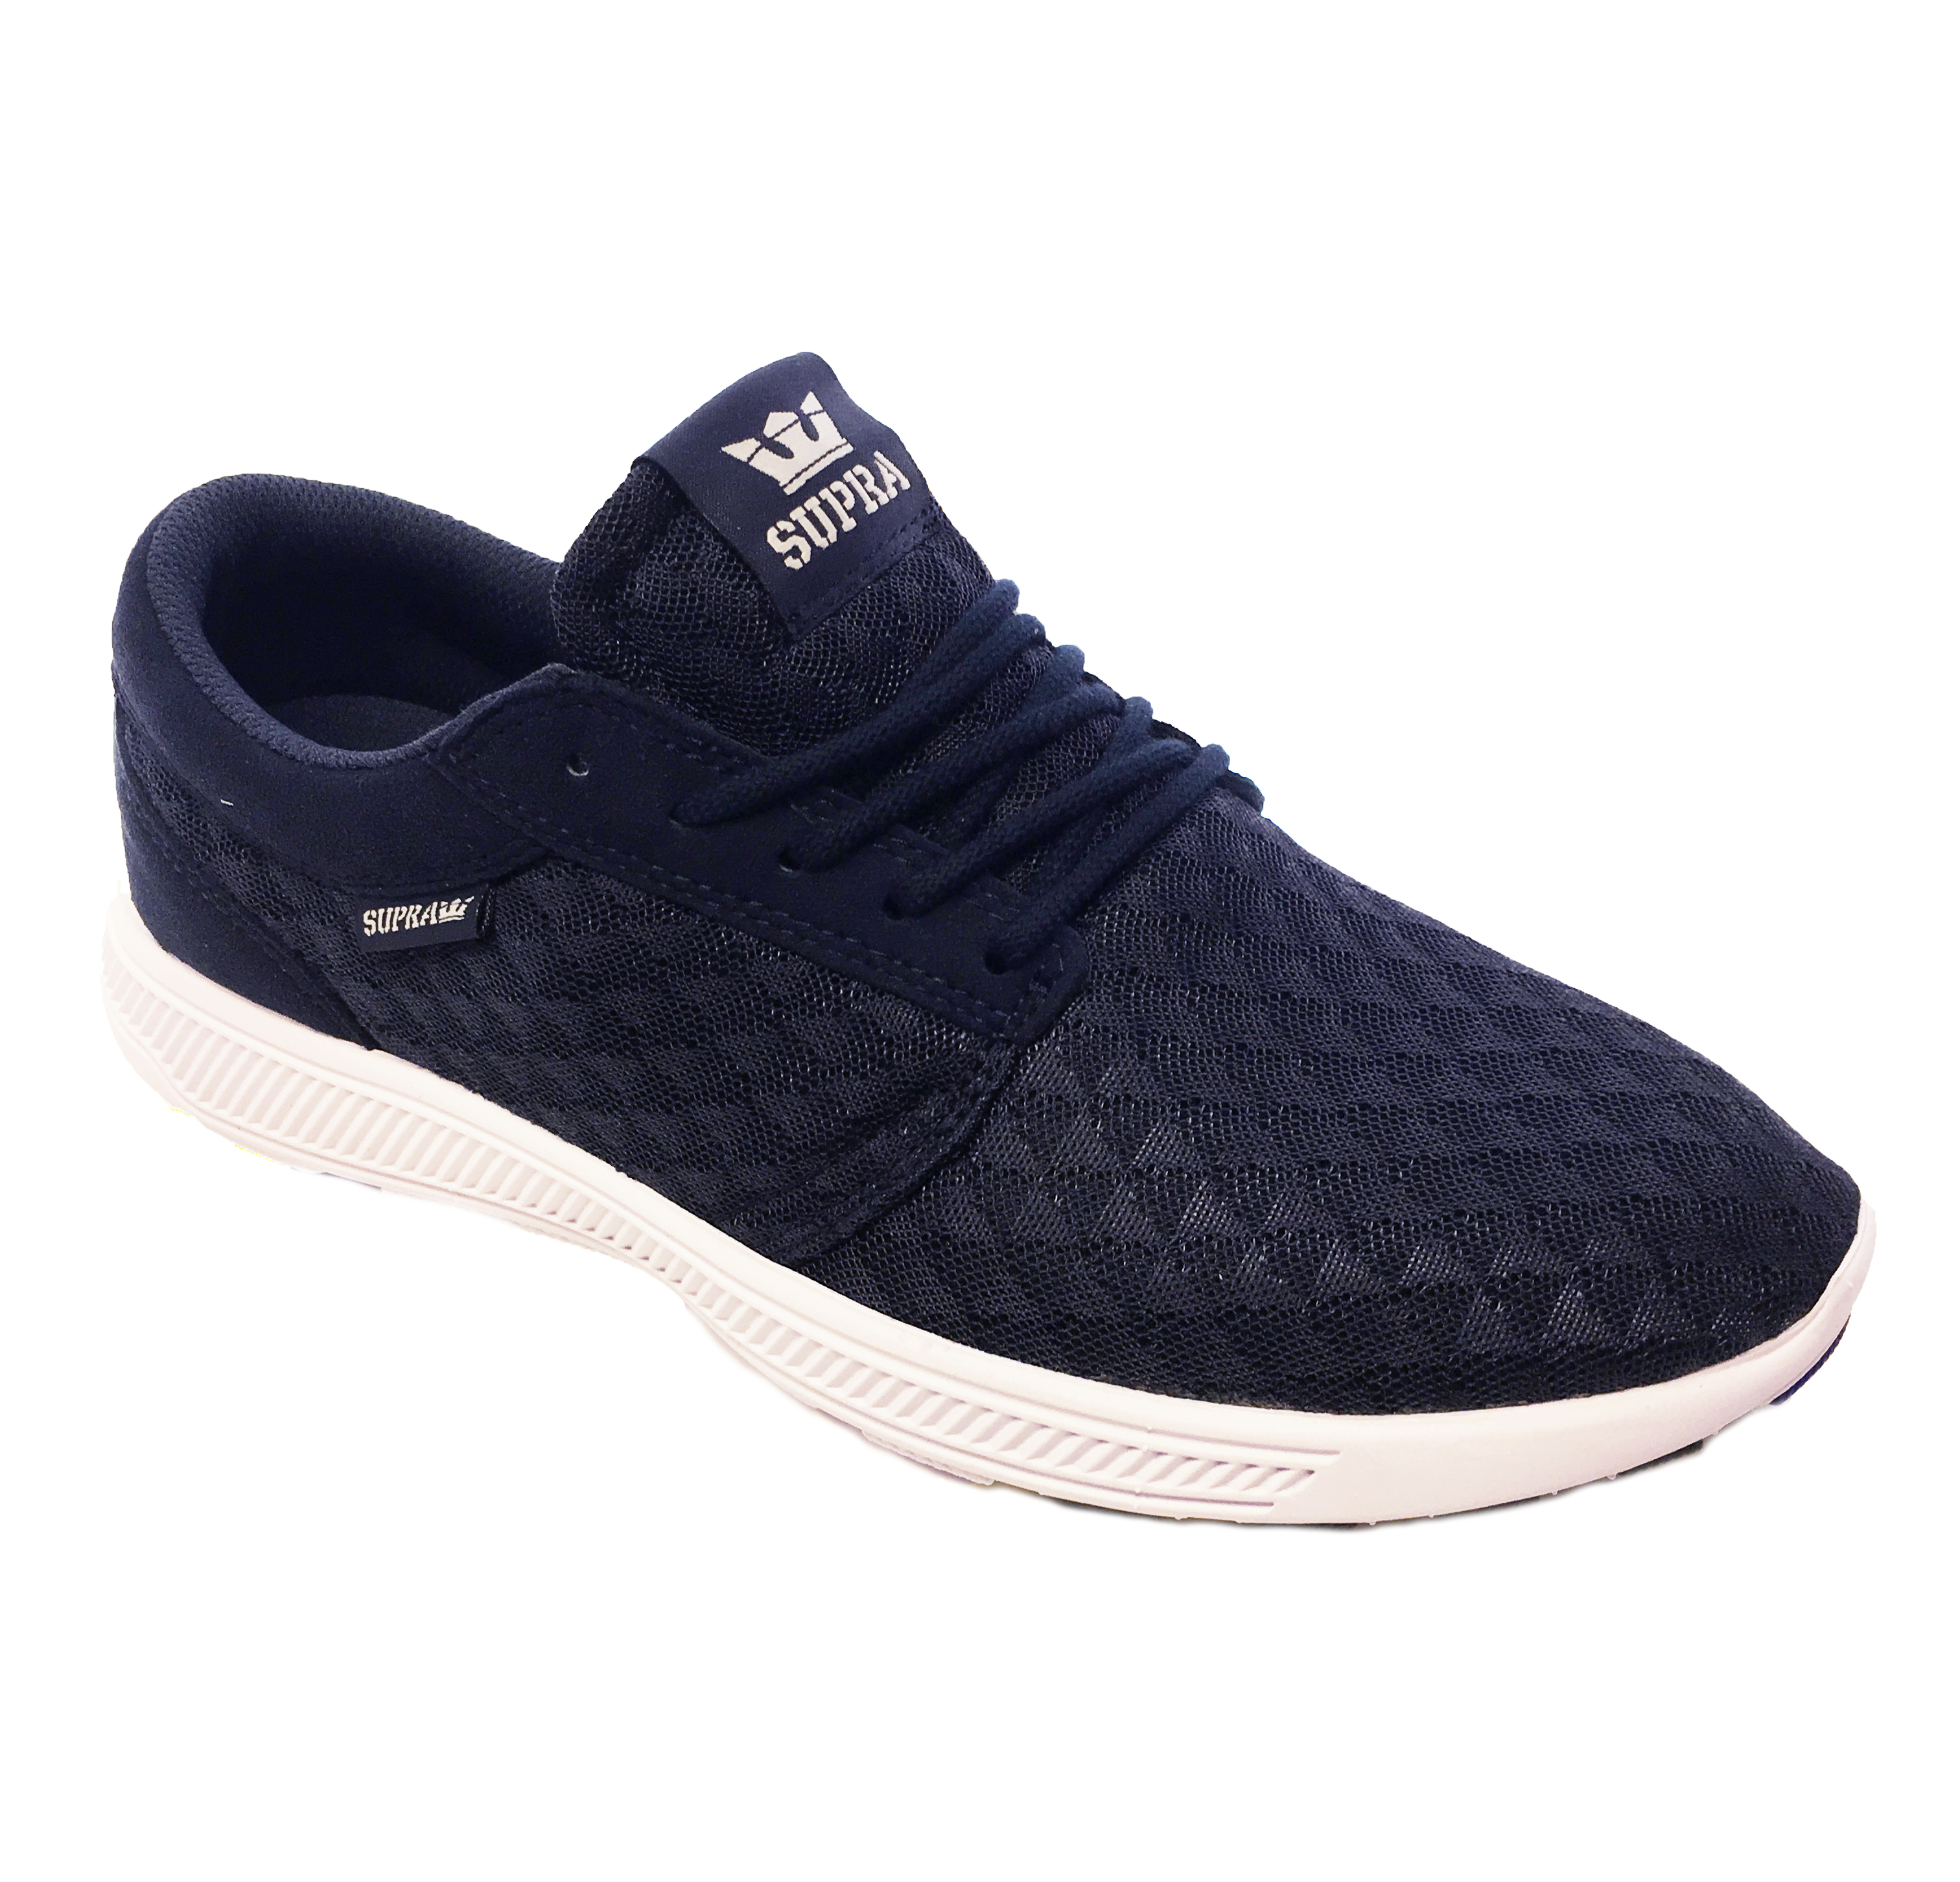 dd8859ae8ee5 SUPRA Hammer Run Lightweight Mesh Trainer Sporty Gym Sneaker Shoe ...